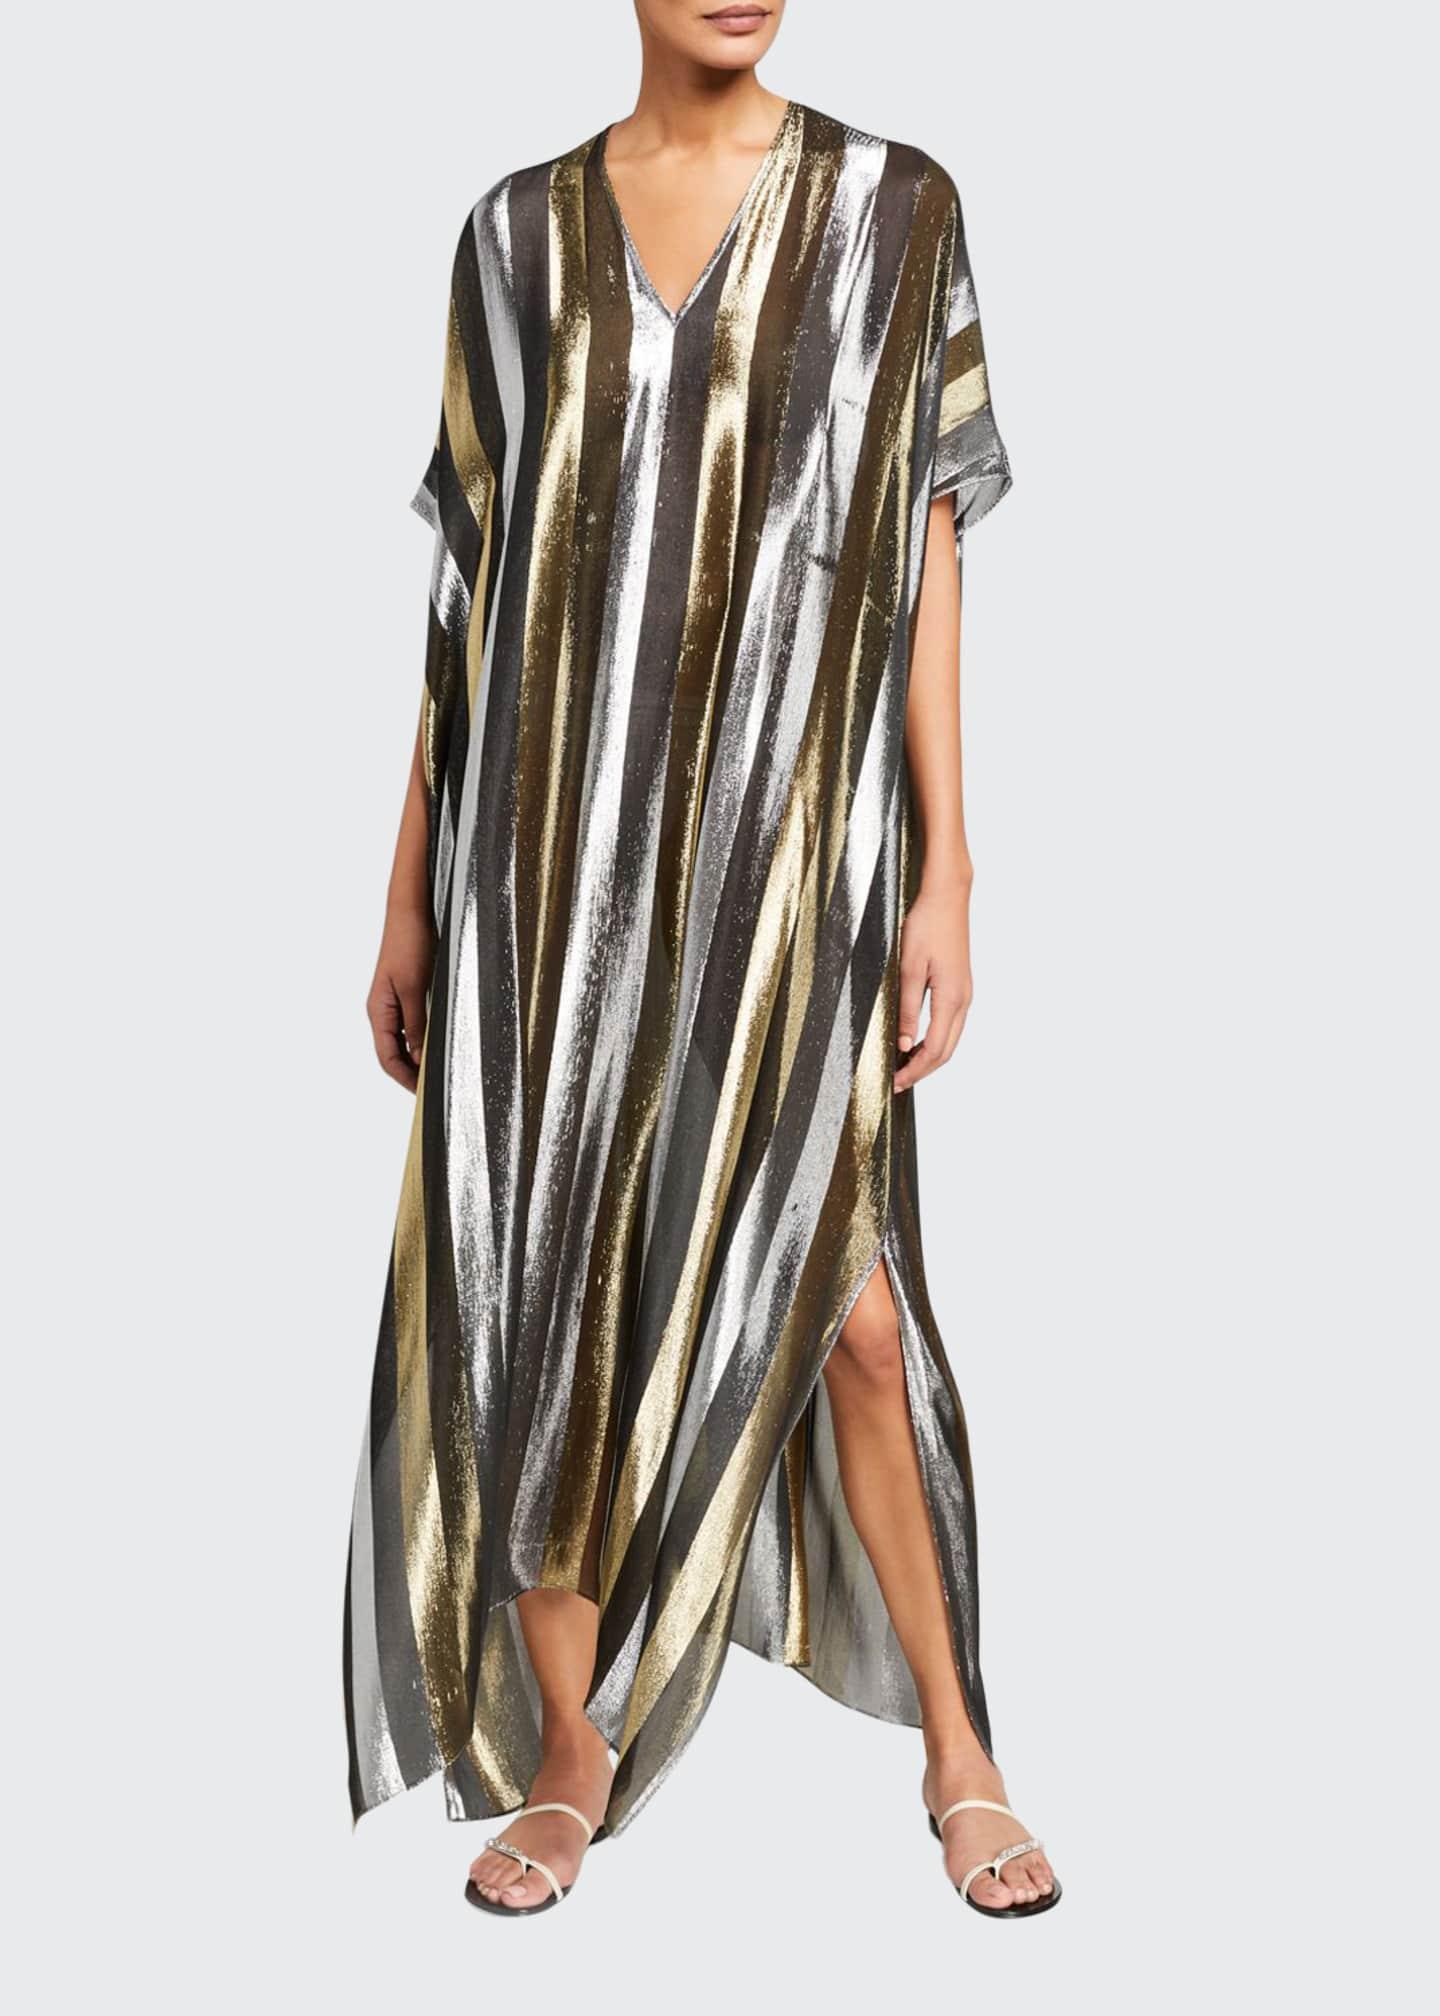 Marie France Van Damme Metallic Stripe Long Caftan